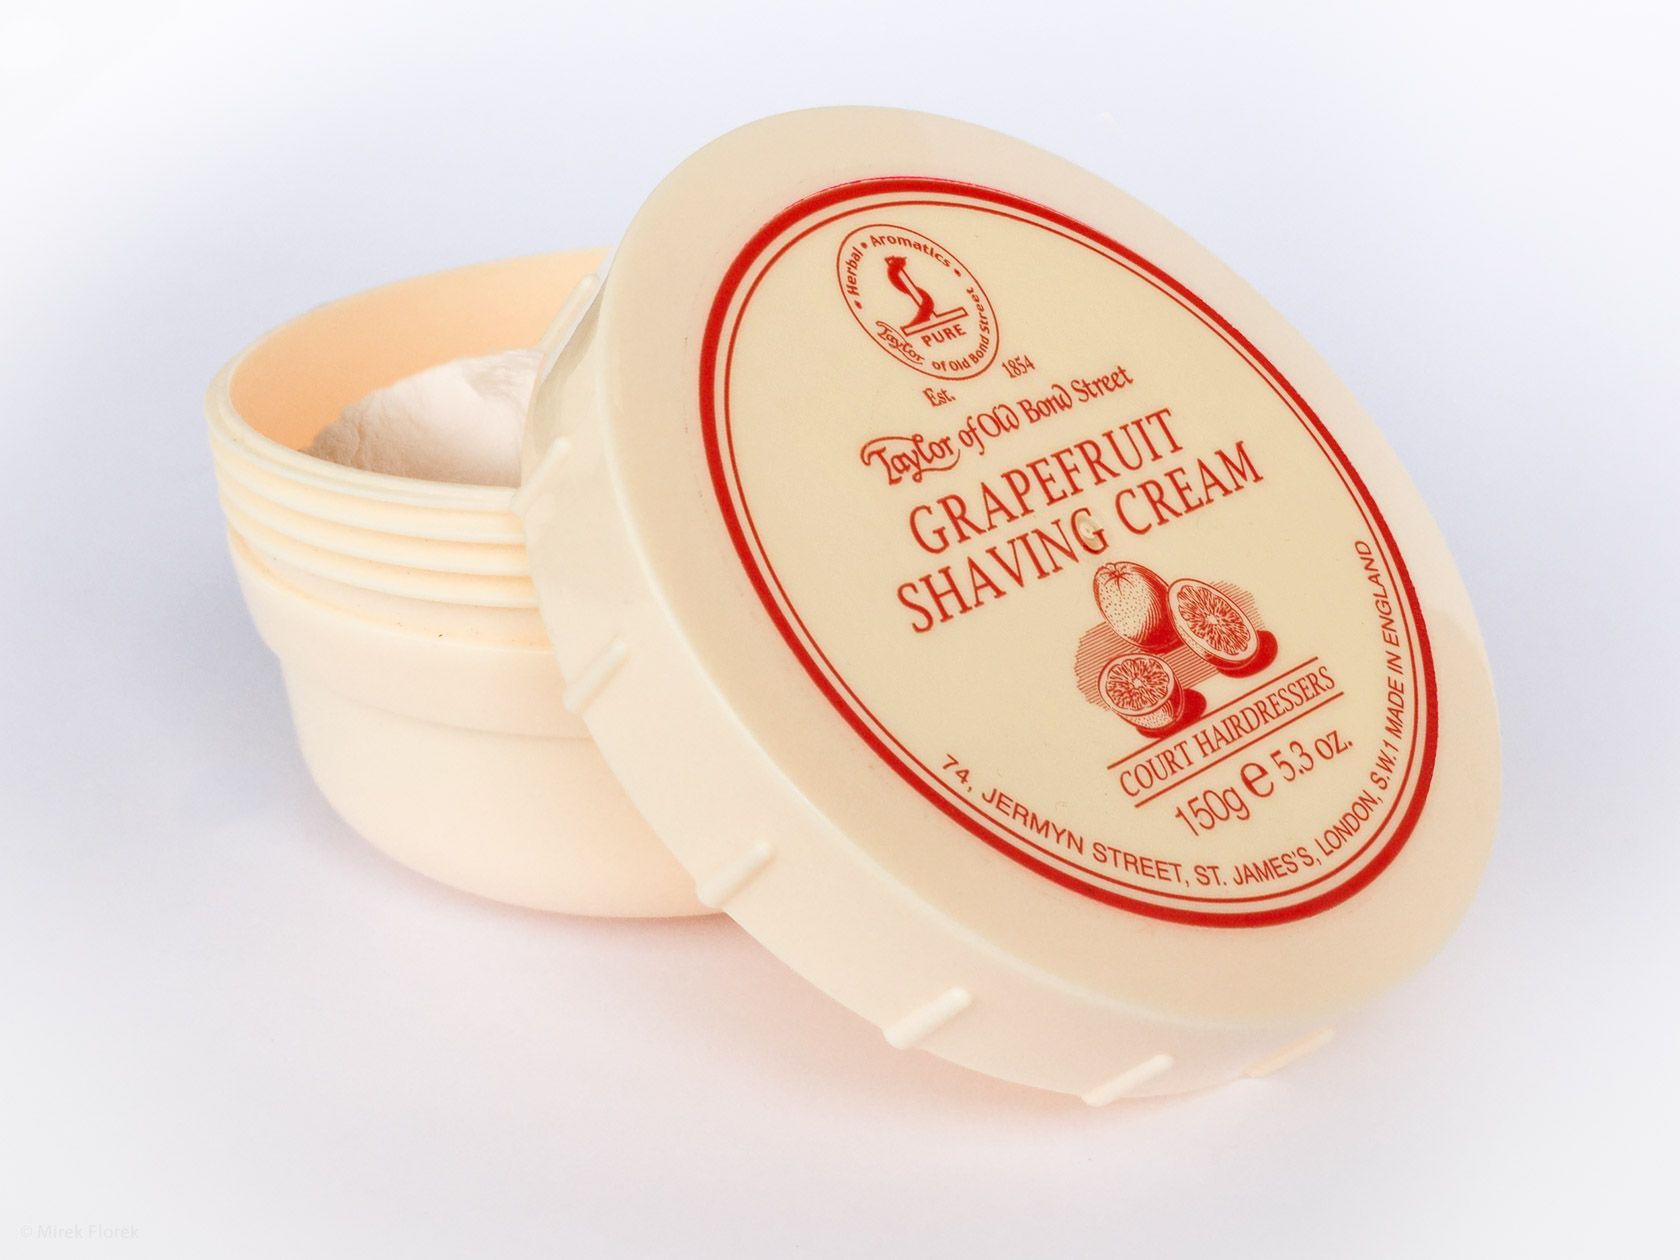 Krem do golenia Taylor of Old Bond Street Grapefruit Shaving Cream